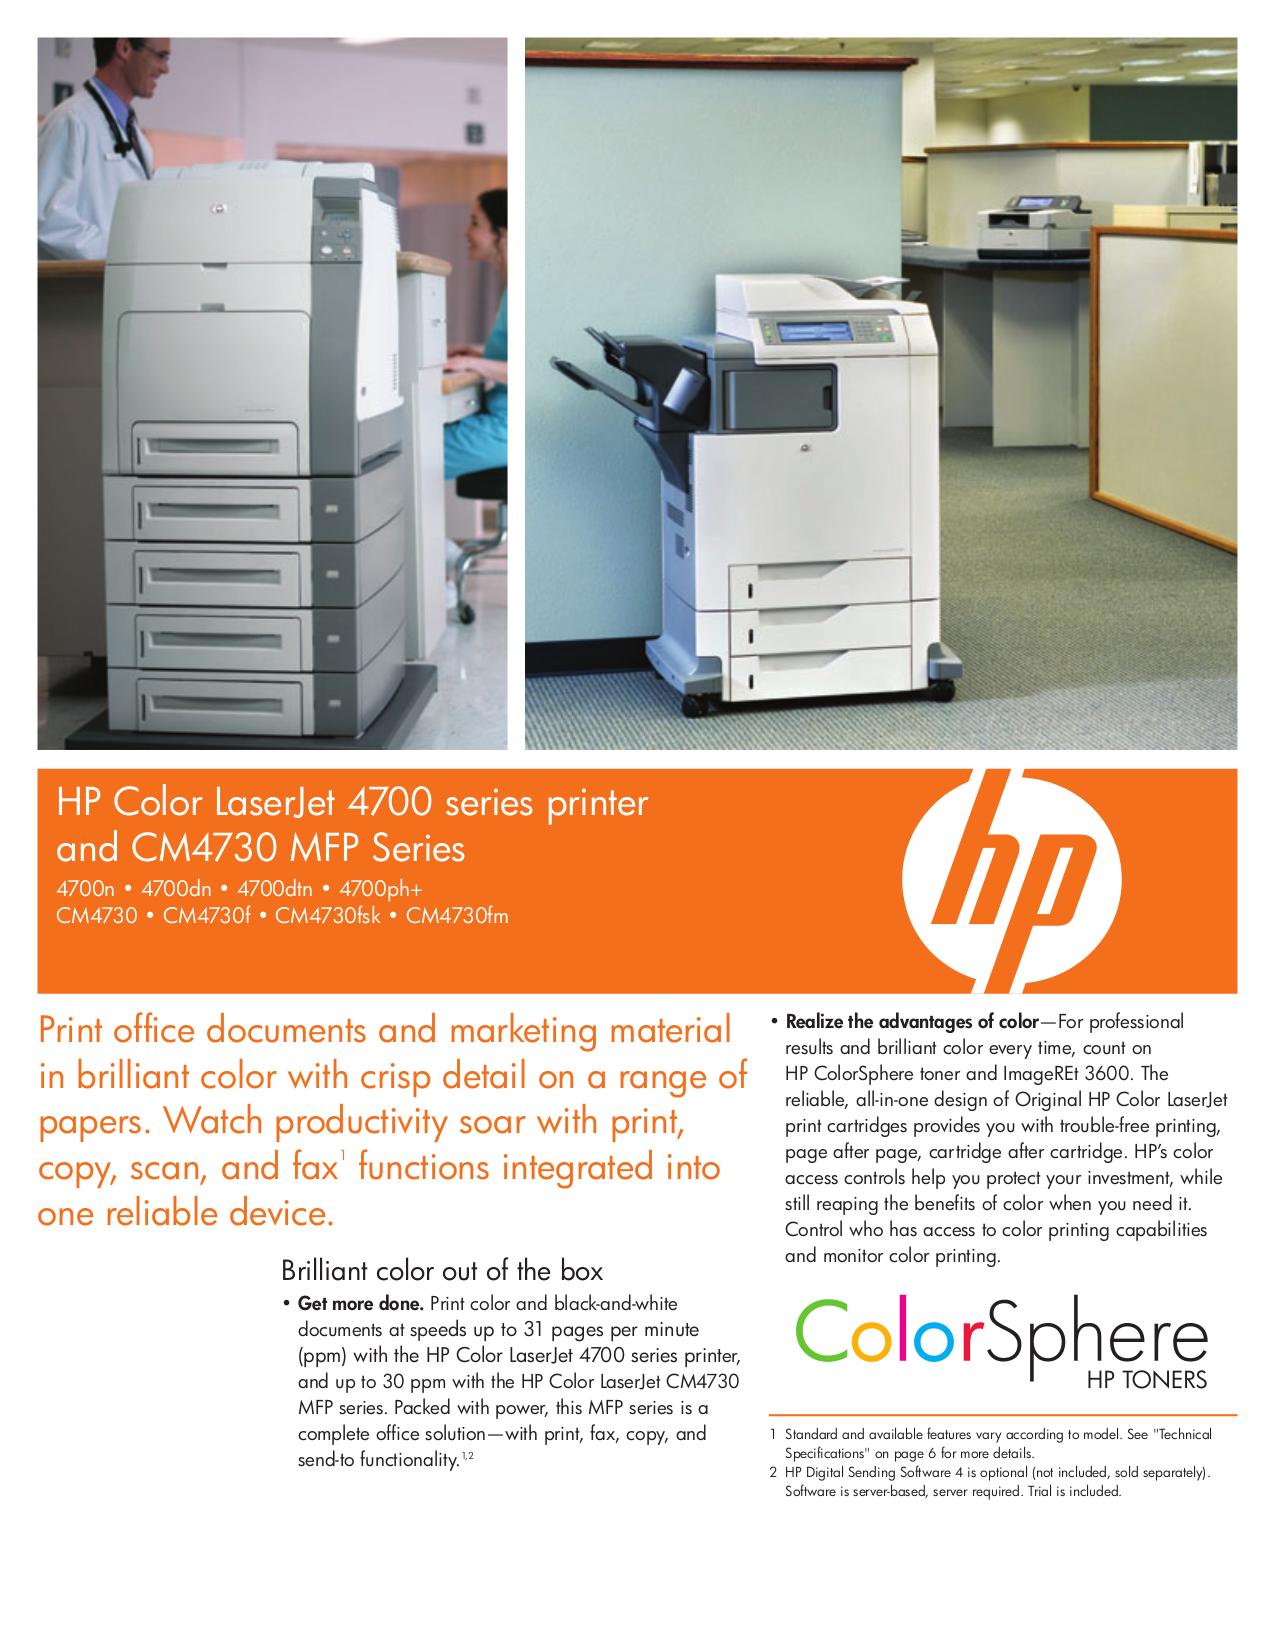 download free pdf for hp laserjet color laserjet cm4730fm rh umlib com cm4730 mfp driver hp cm4730 mfp user manual